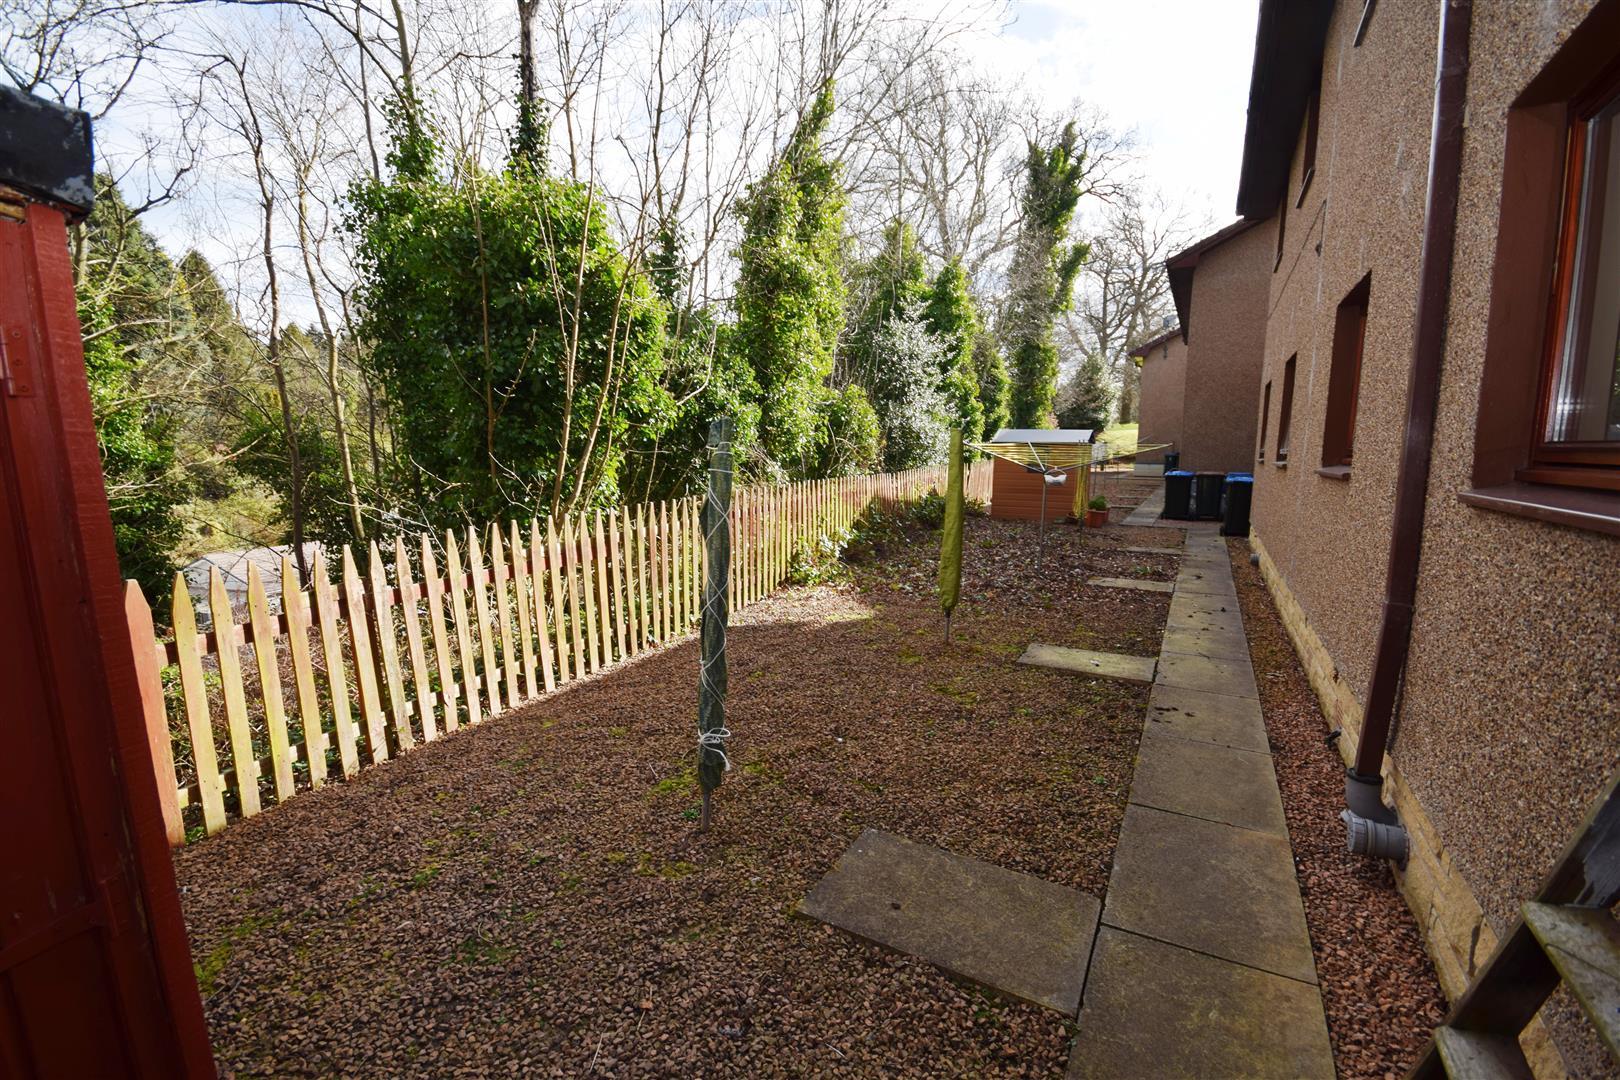 2 Woodland Court, Goshen Road, Scone, Perthshire, PH2 6UB, UK